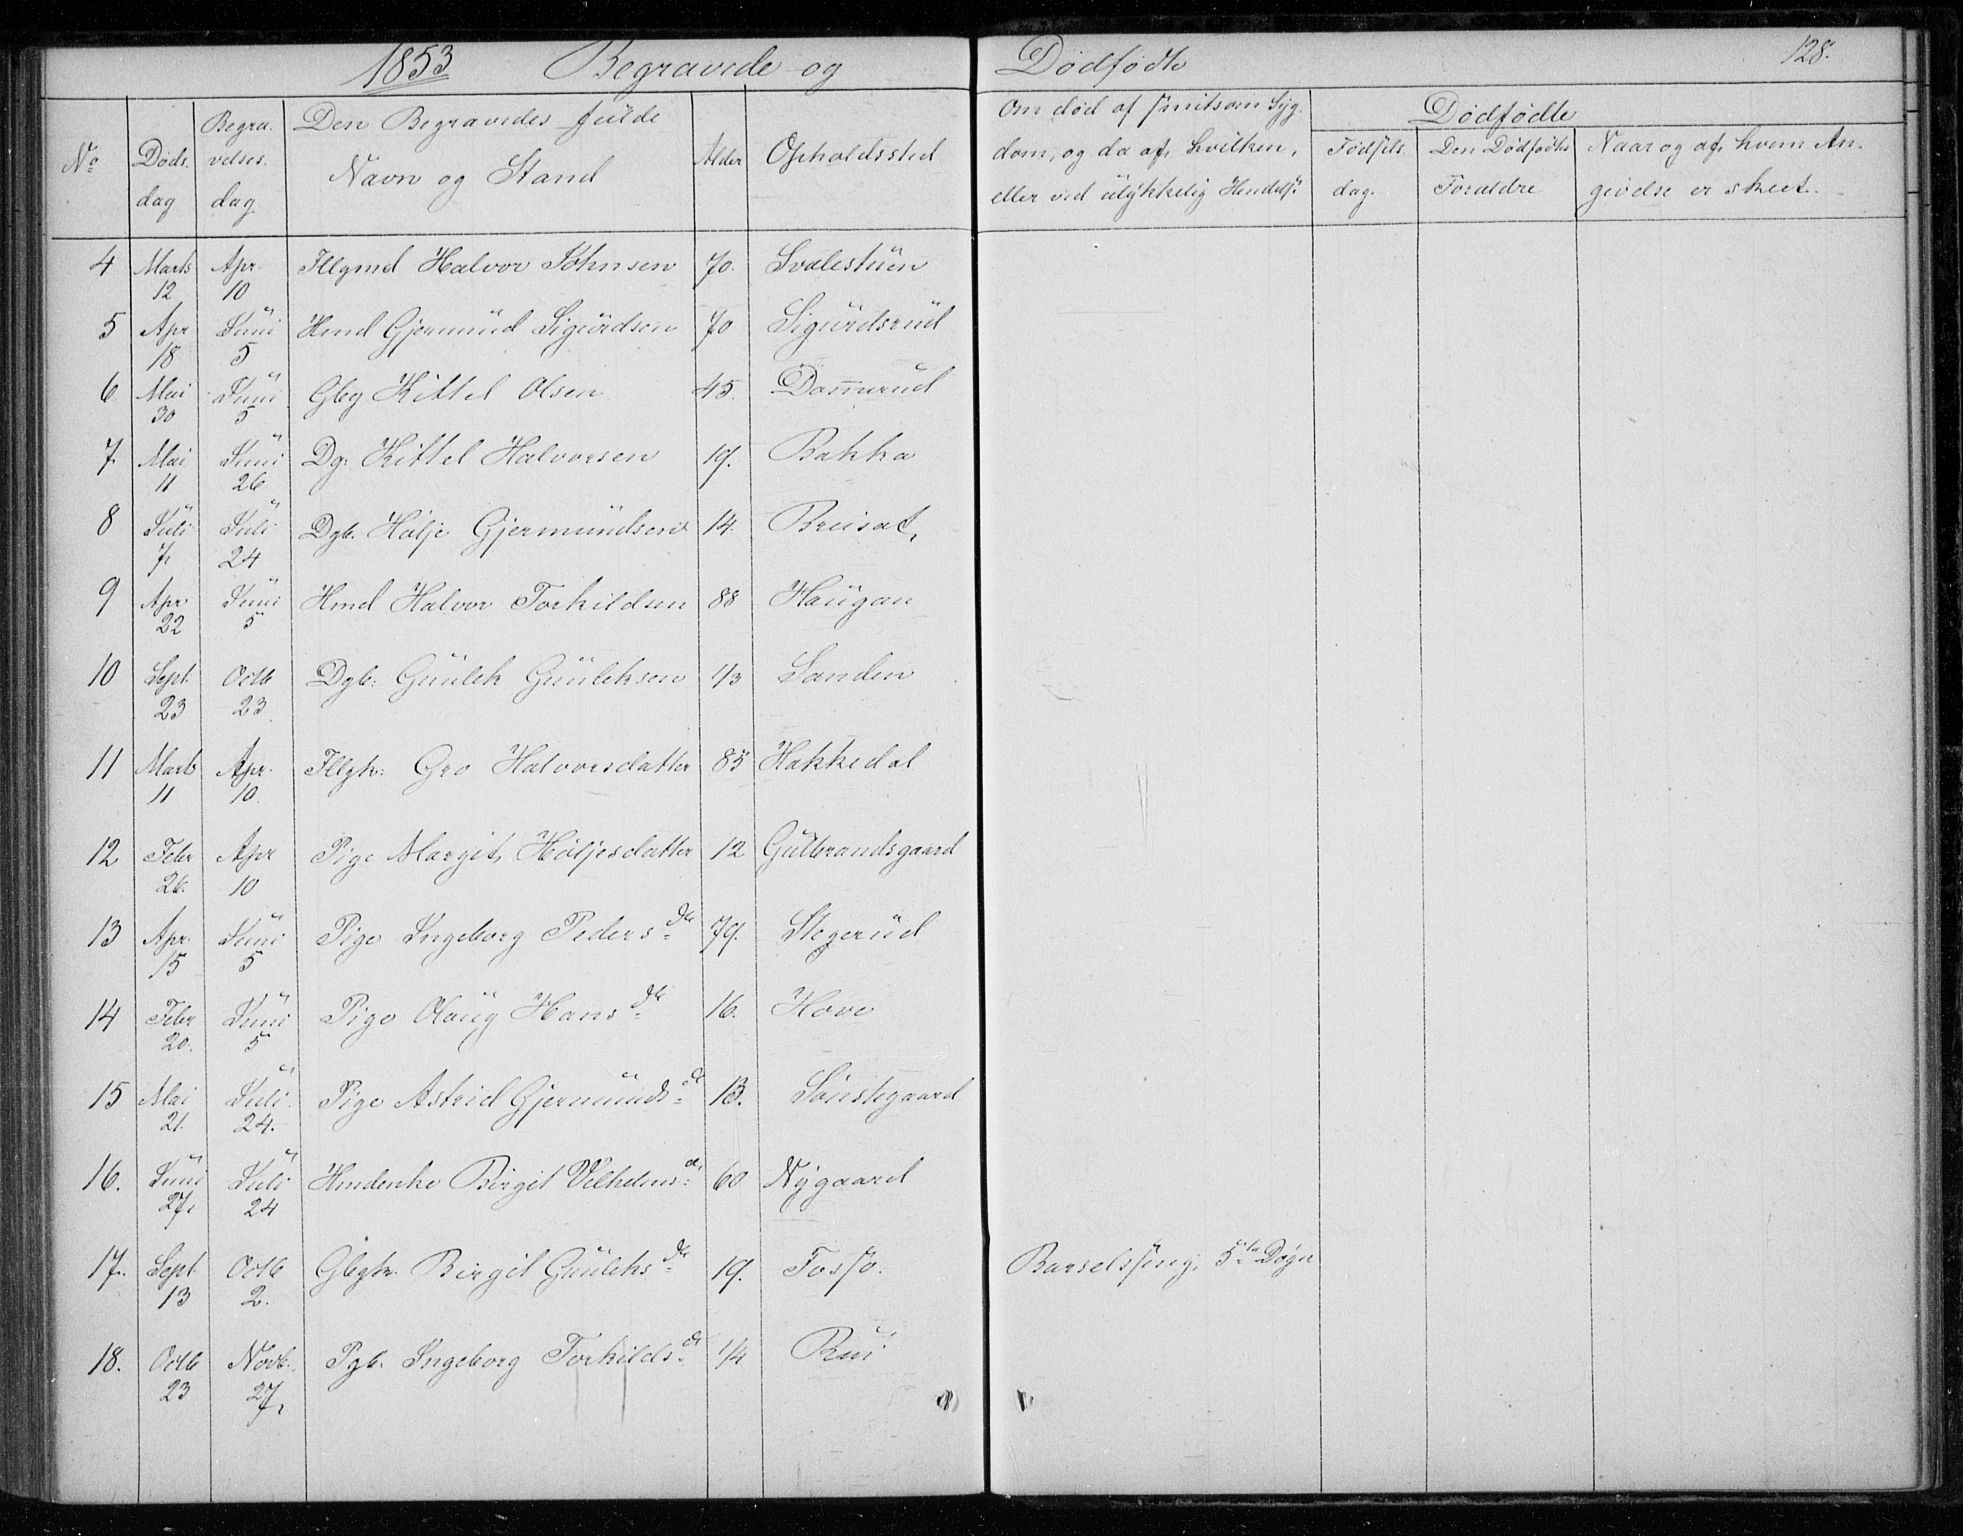 SAKO, Gransherad kirkebøker, F/Fb/L0003: Ministerialbok nr. II 3, 1844-1859, s. 128